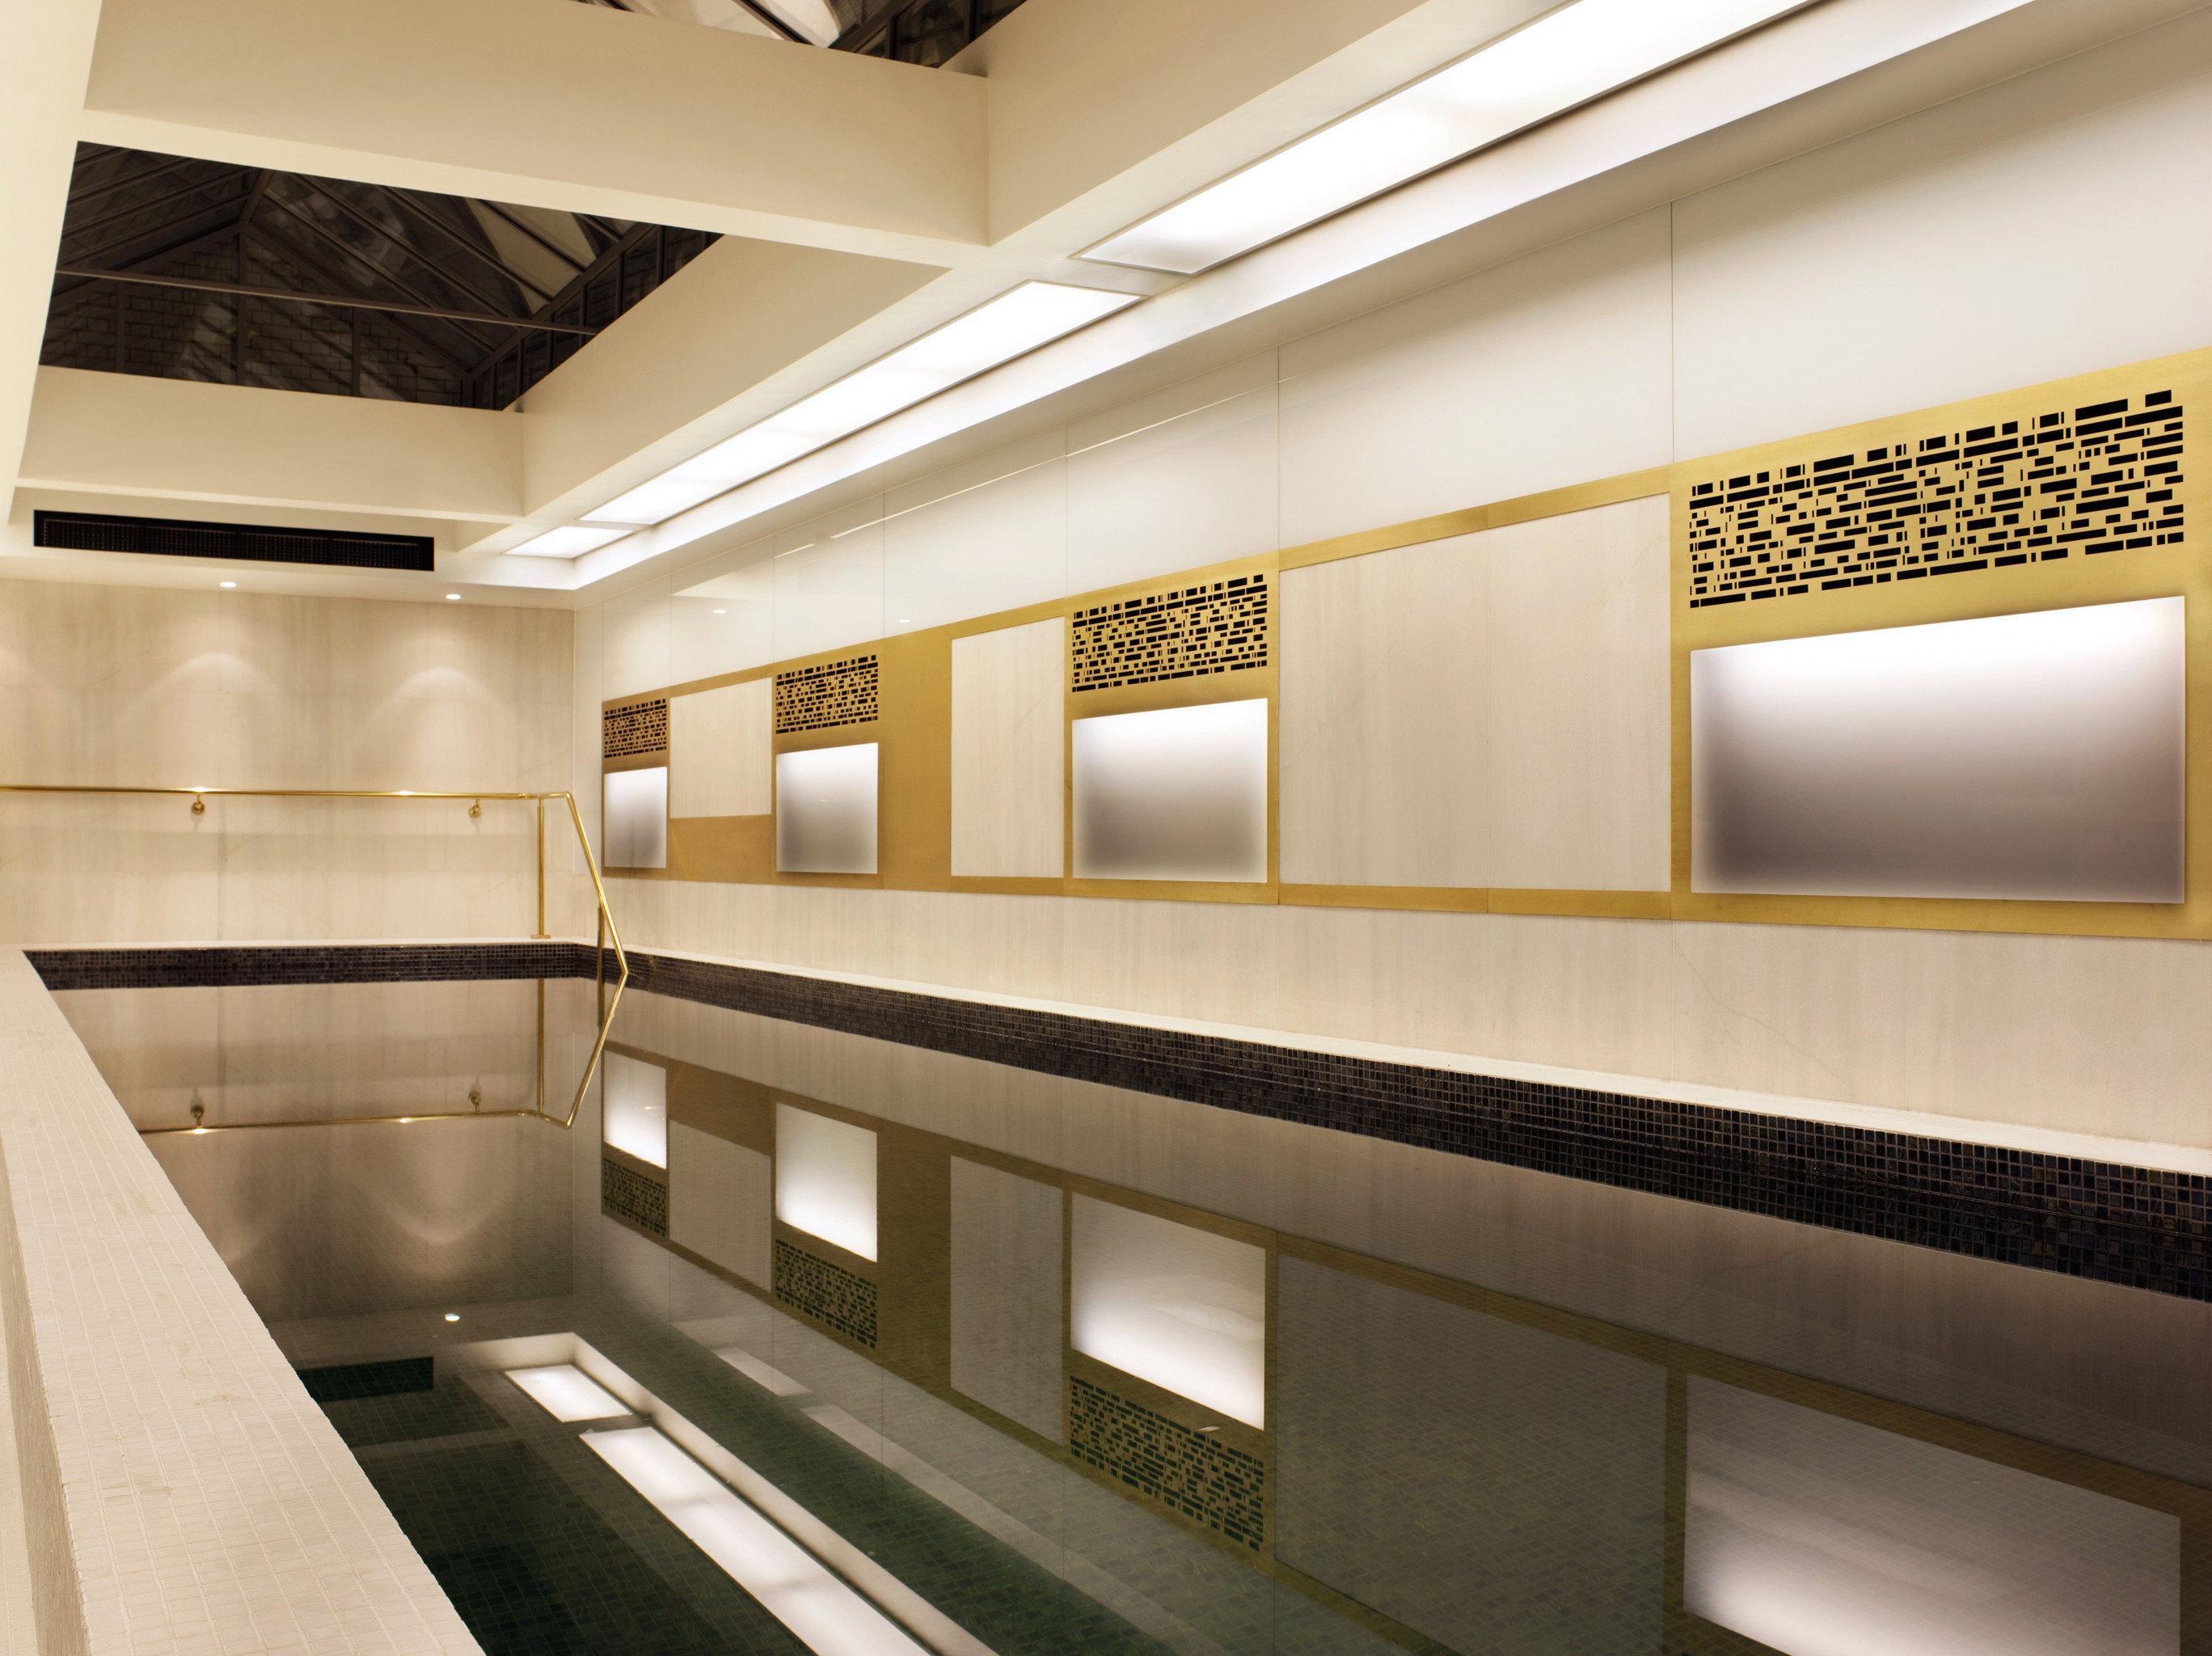 Modern Pool Architecture Lobby lighting headquarters auditorium public transport step